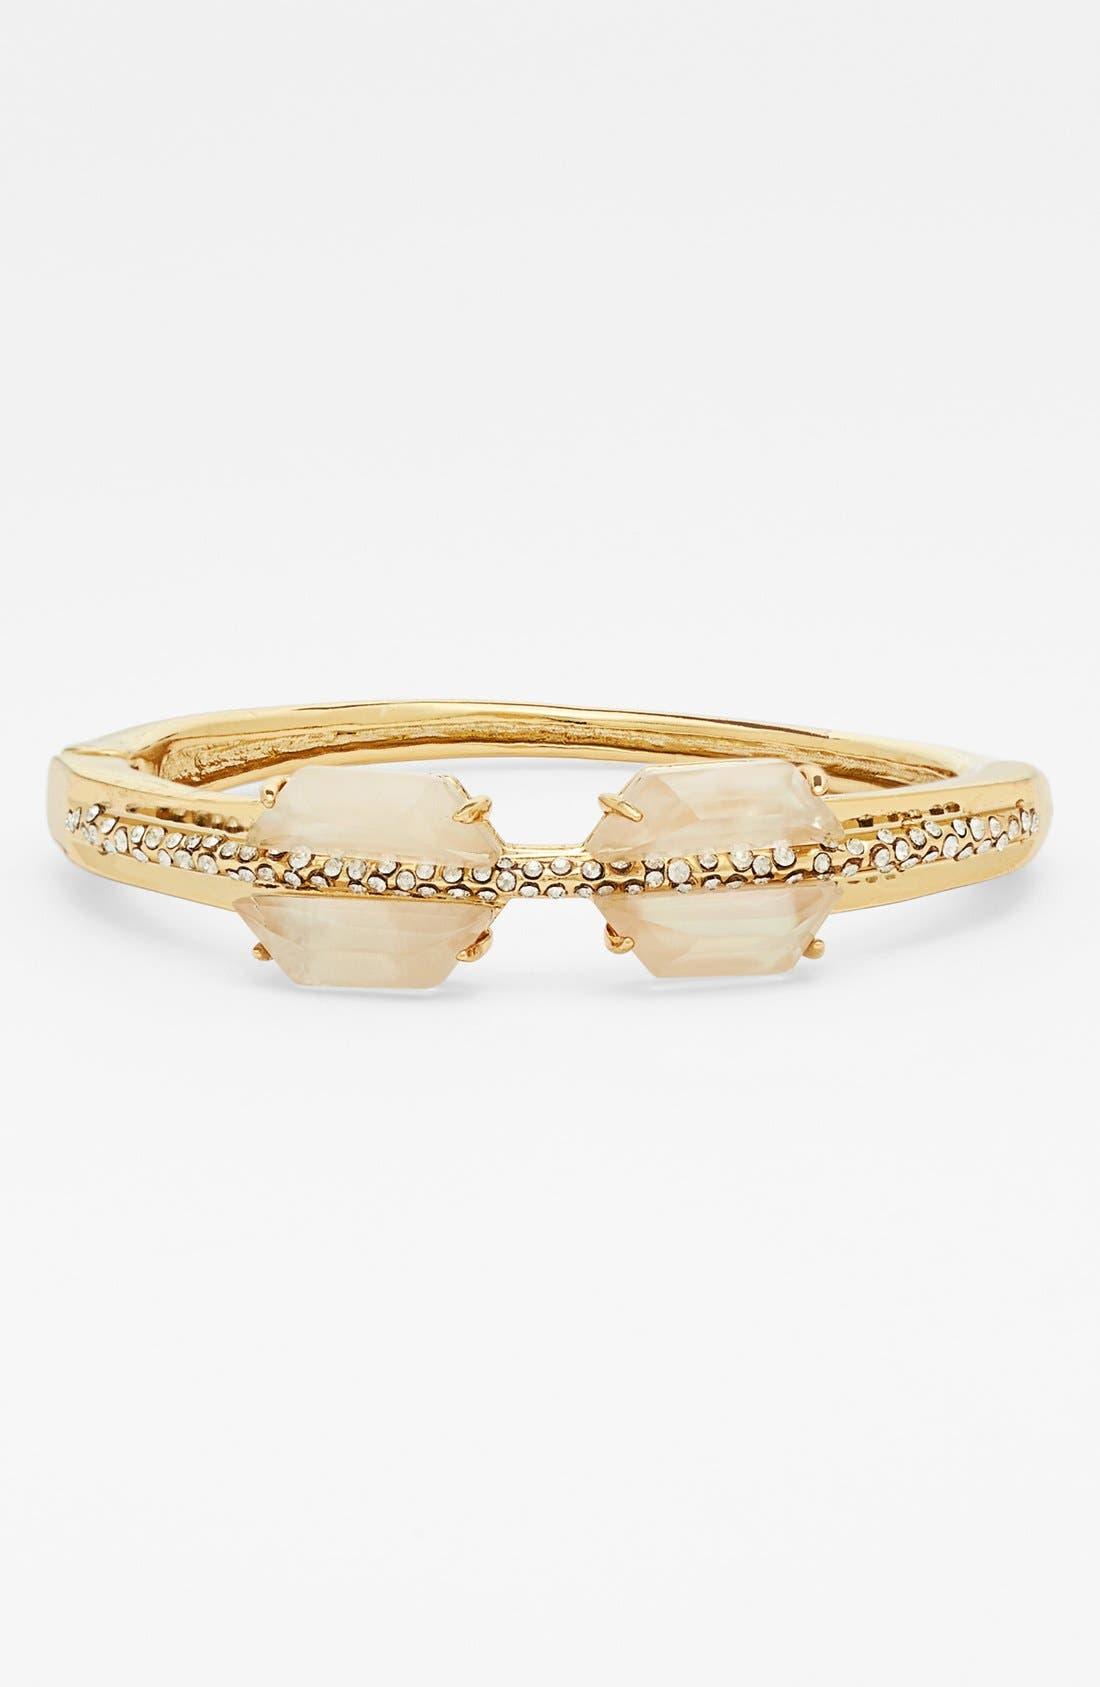 Alternate Image 1 Selected - Alexis Bittar 'Miss Havisham' Doublet Bracelet